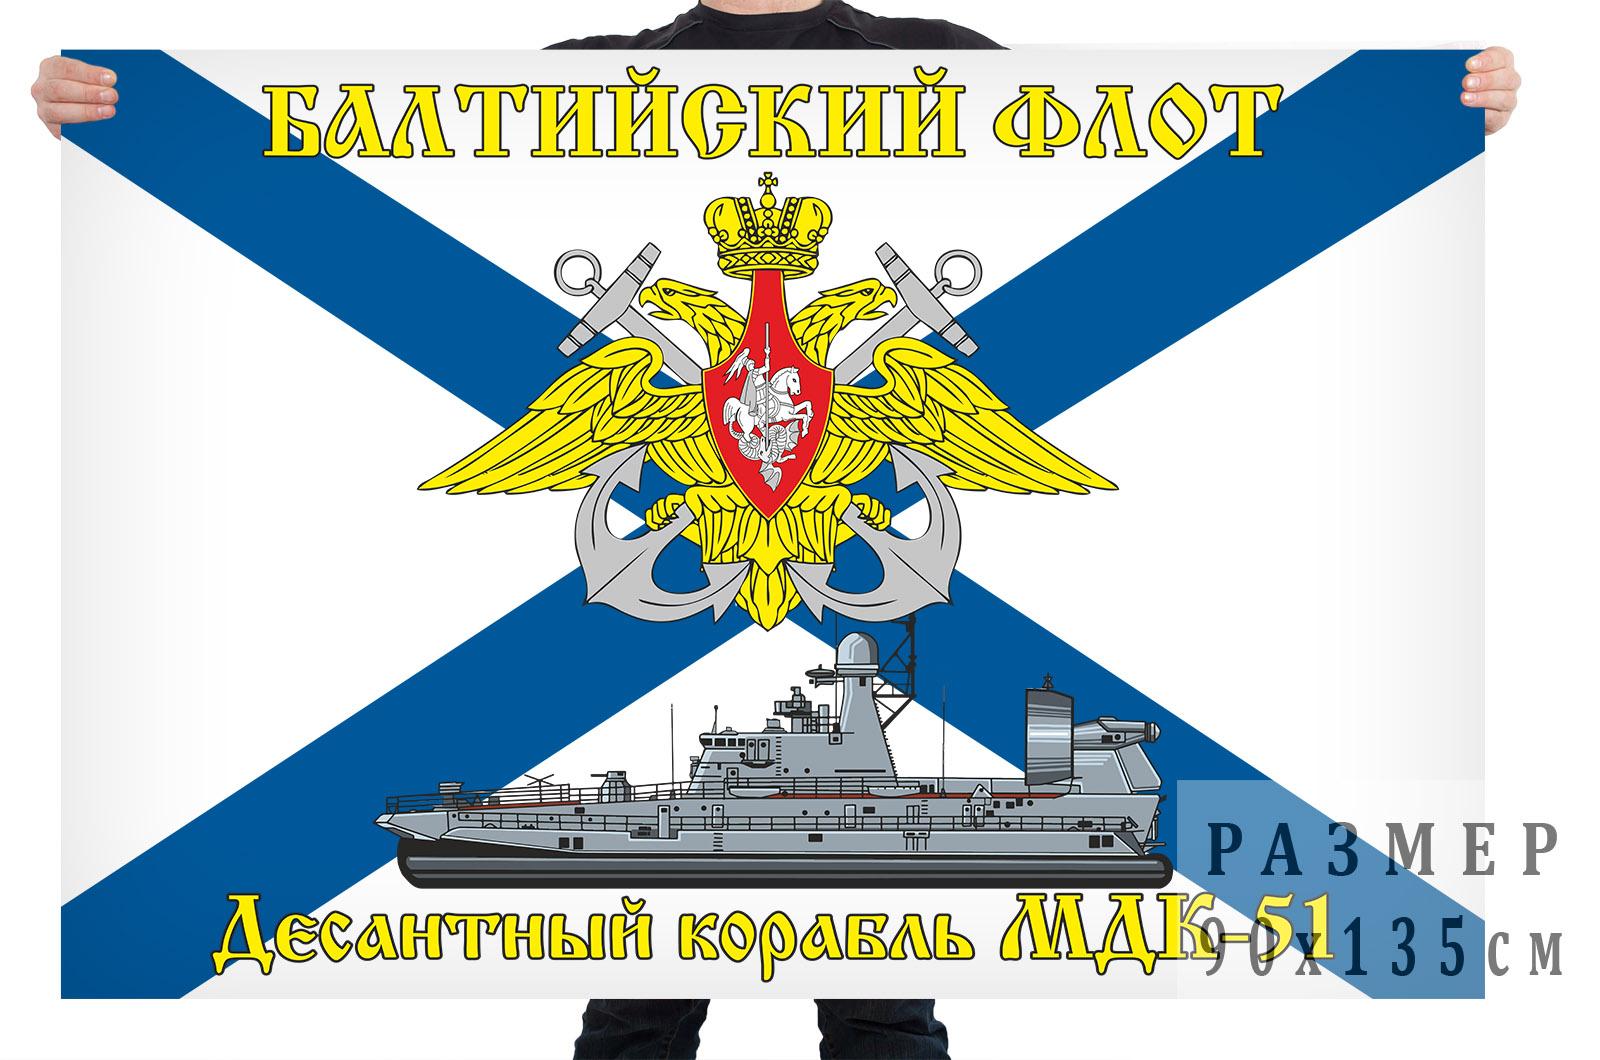 Флаг десантного корабля на воздушной подушке МДК-51